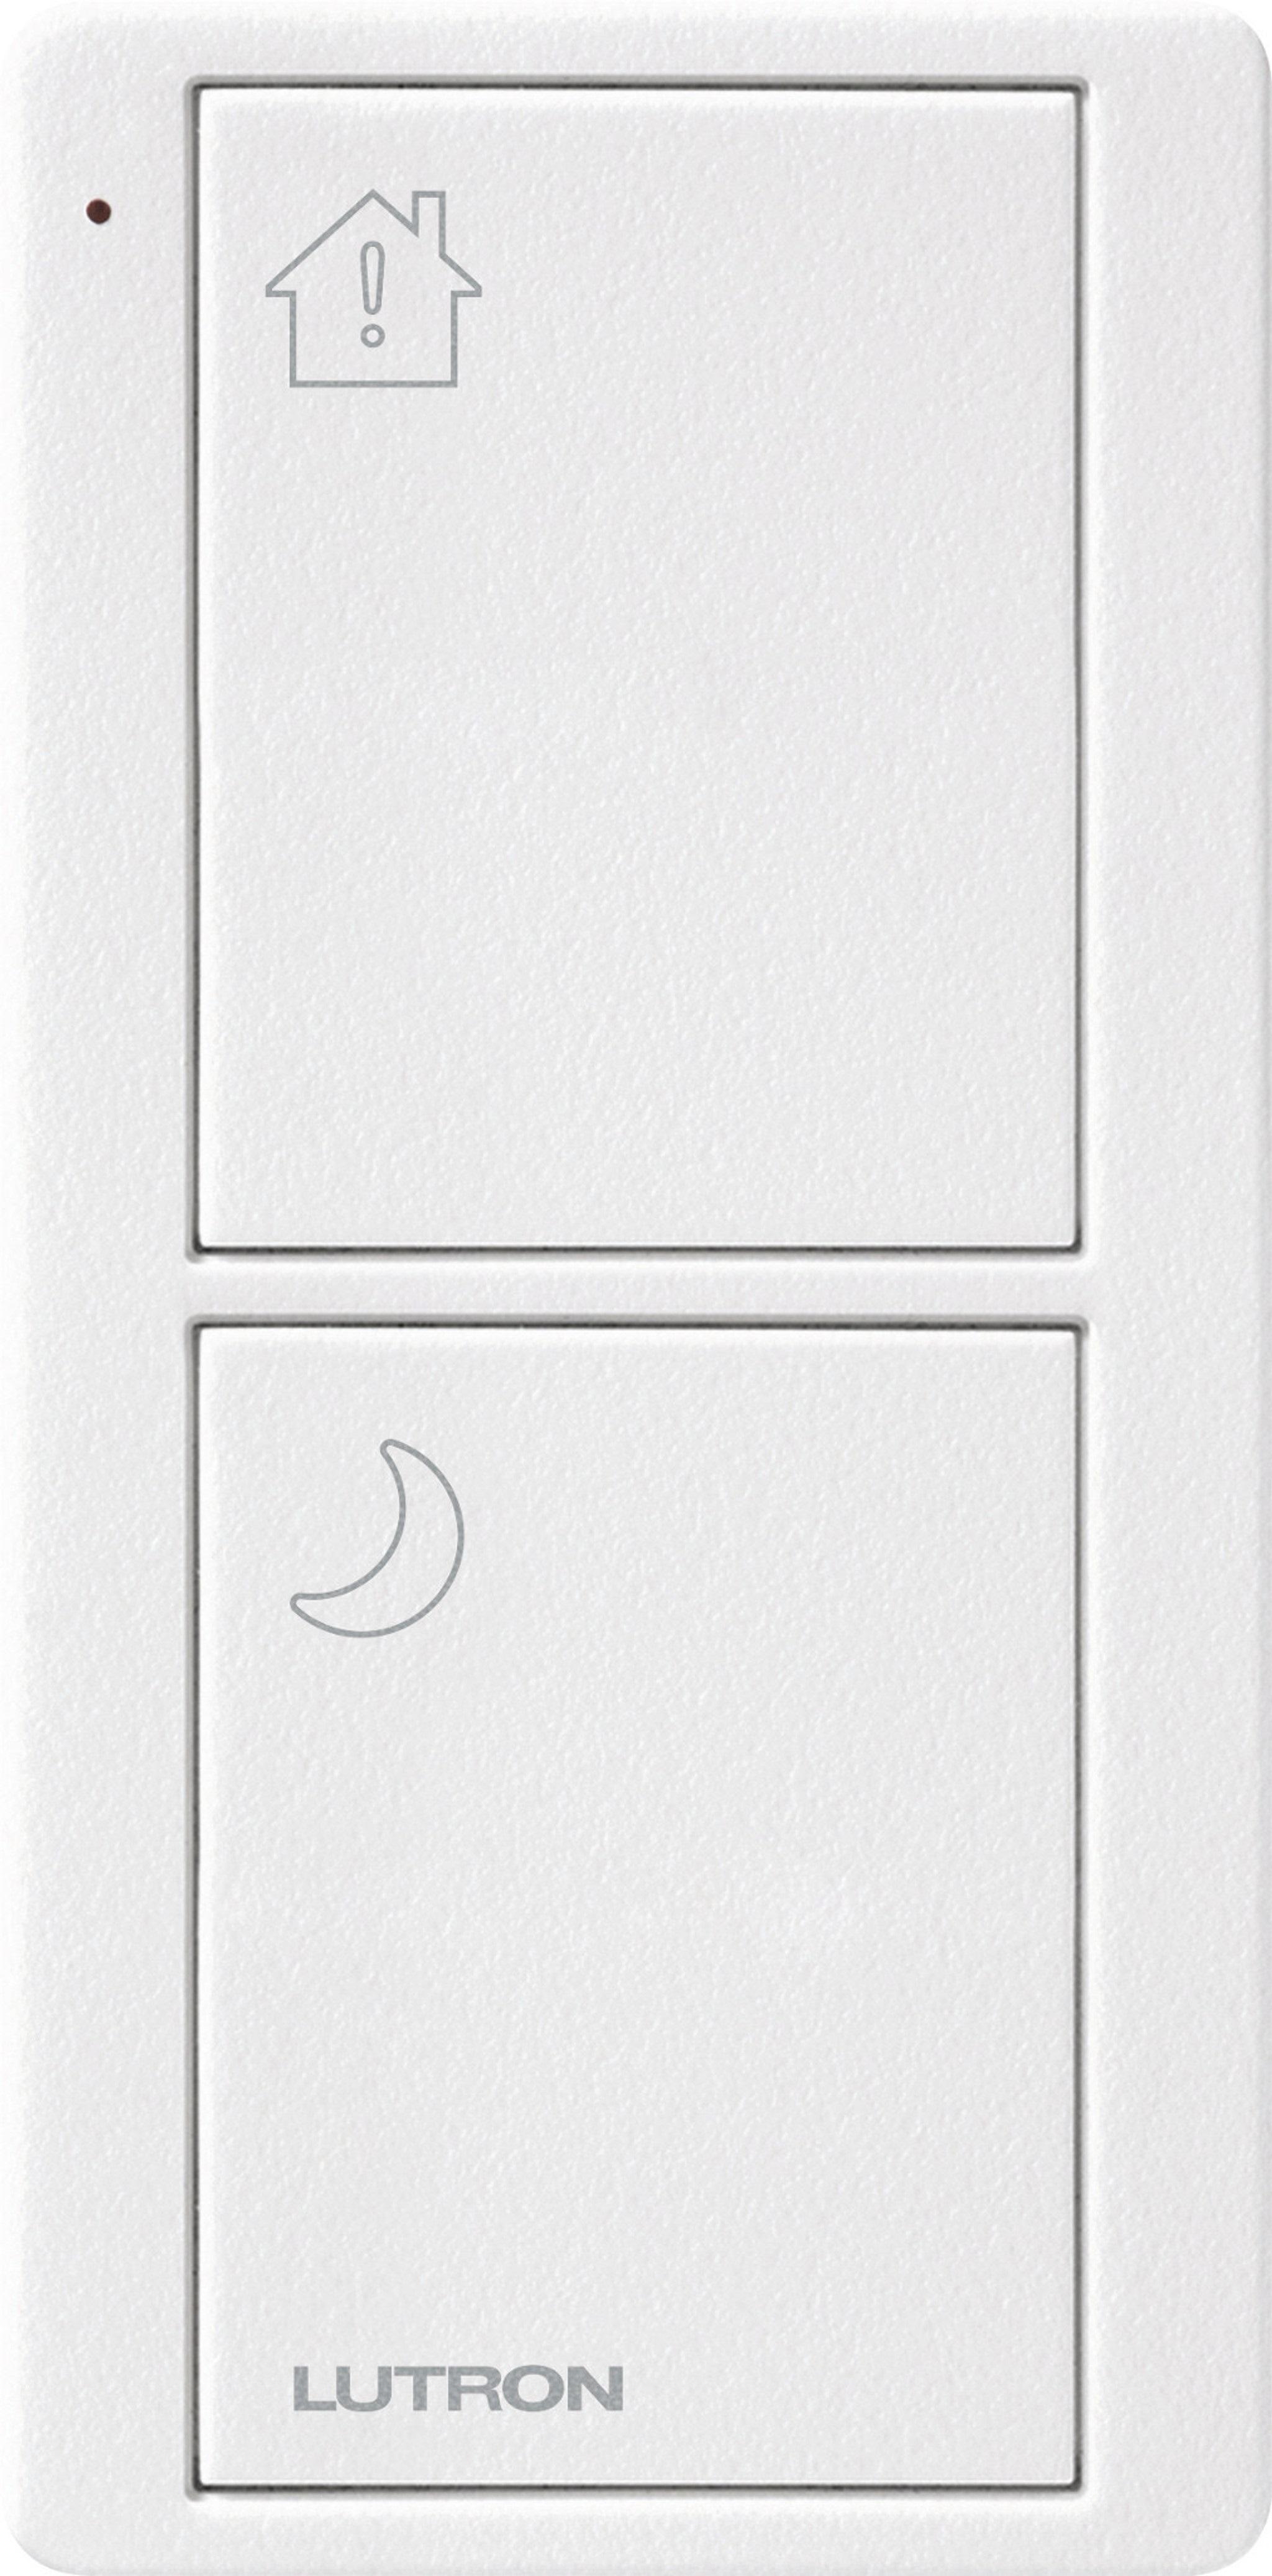 Lutron Pico RF 2 Button Control (Artic White) (Bedside Model)